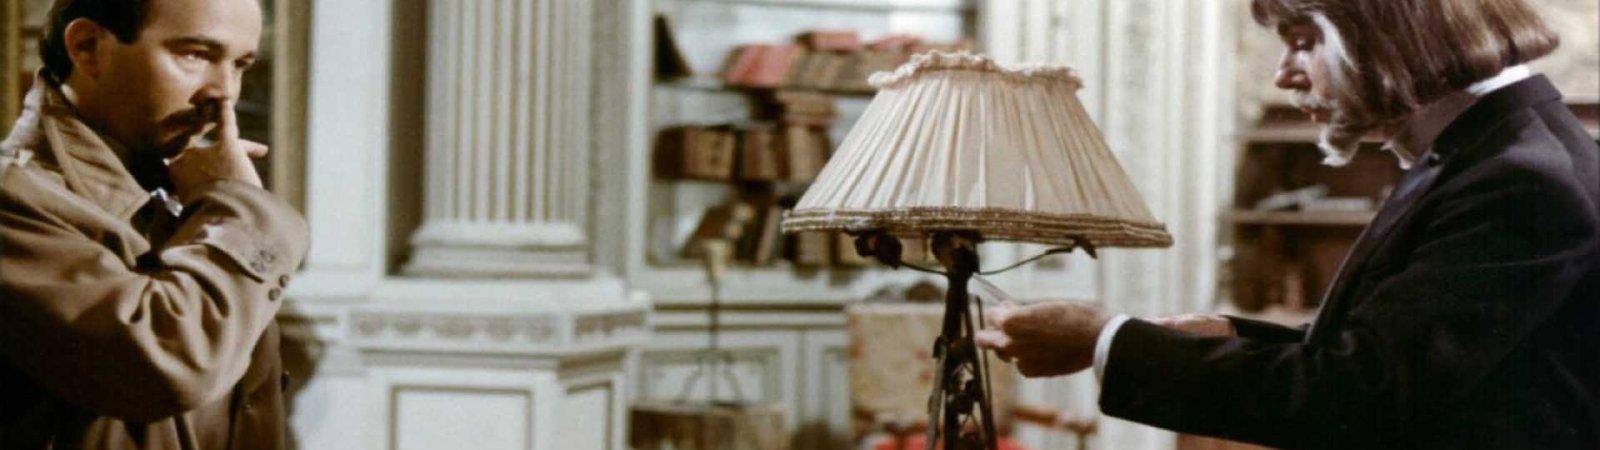 Photo du film : Les charlots contre dracula